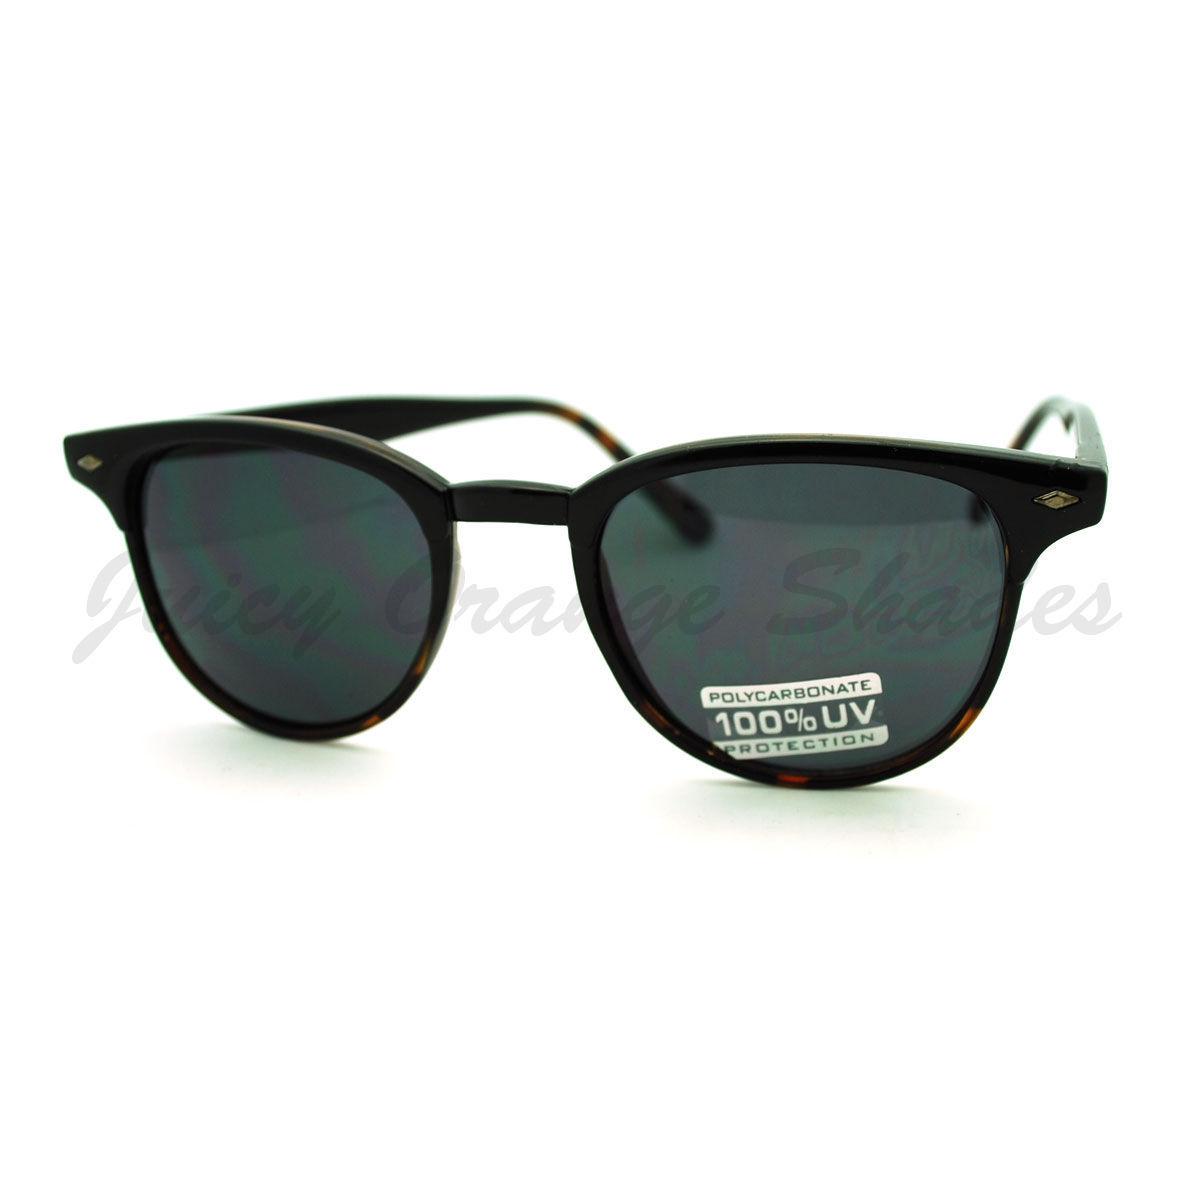 Thin Round Side Horn Rimmed Sunglasses Unisex Vintage Retro